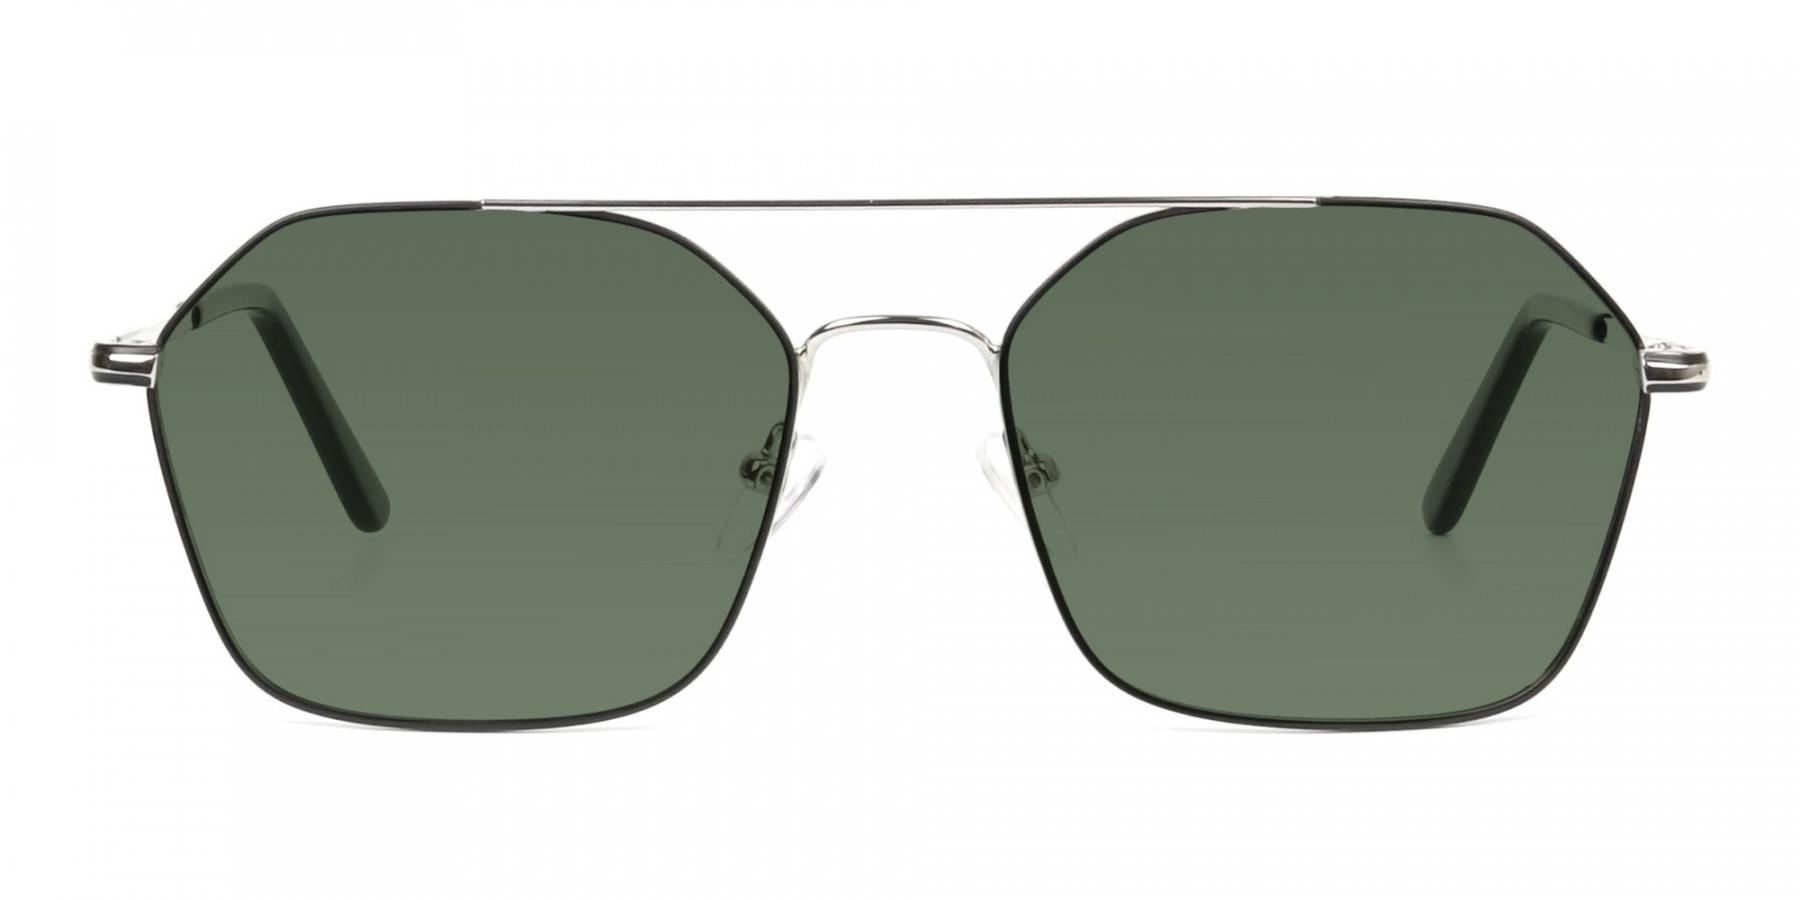 black-and-silver-geomatric-metal-aviator-green-tinted-sunglasses-3